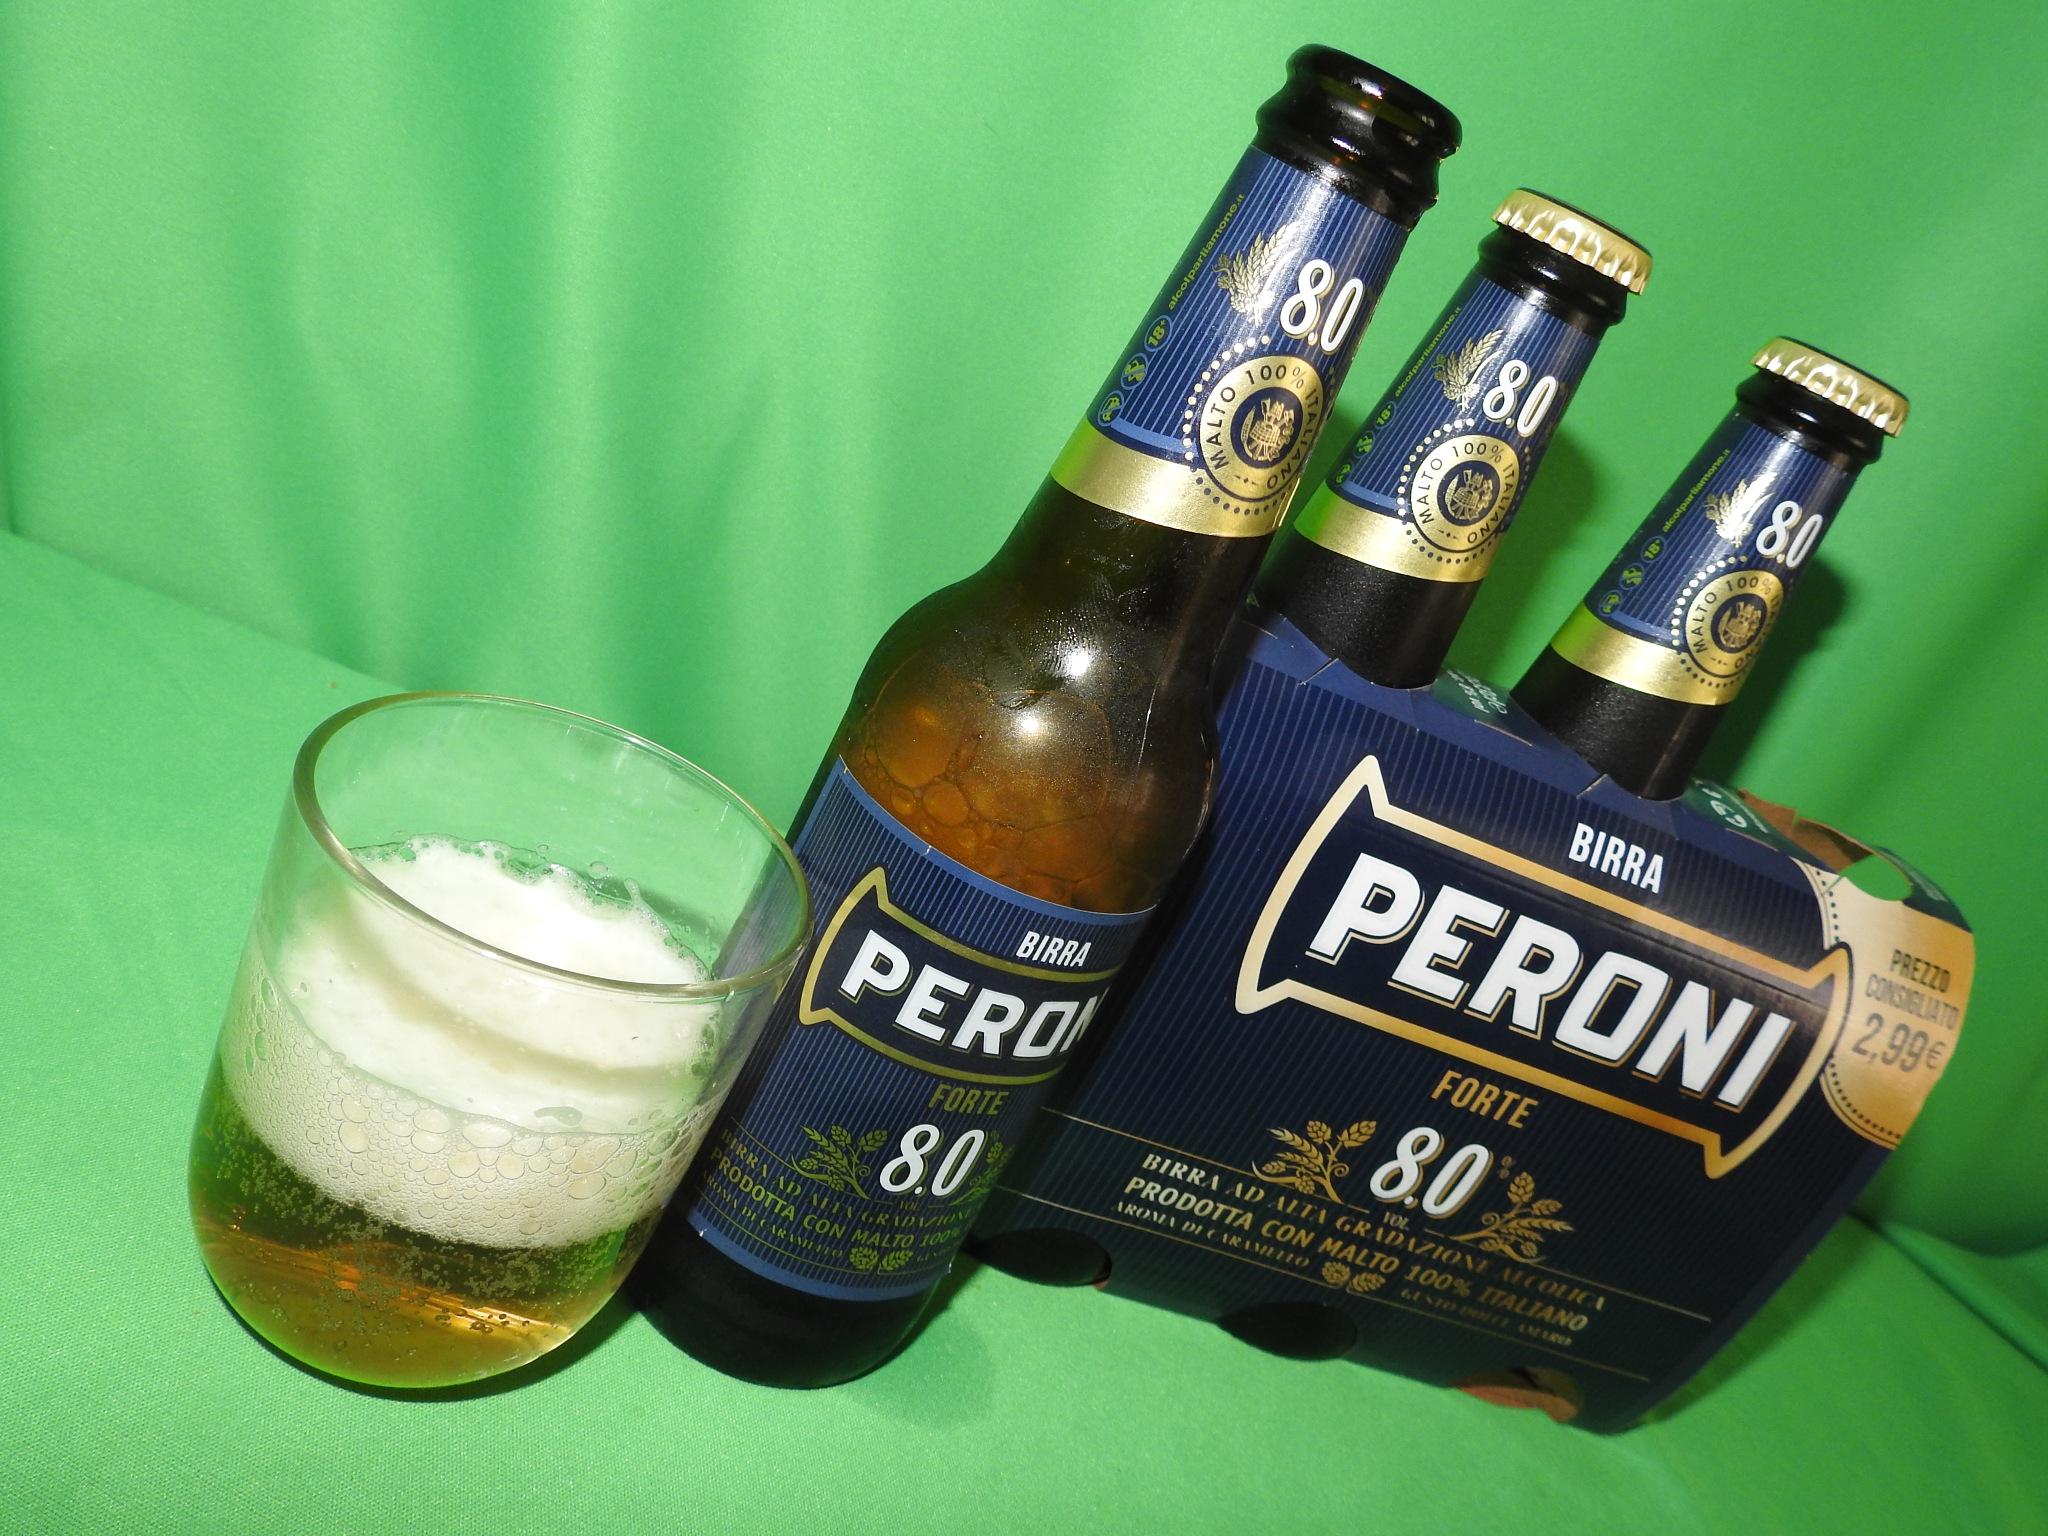 Italian Beer - Birra Peroni Forte - 8°  by Arnaldo De Lisio